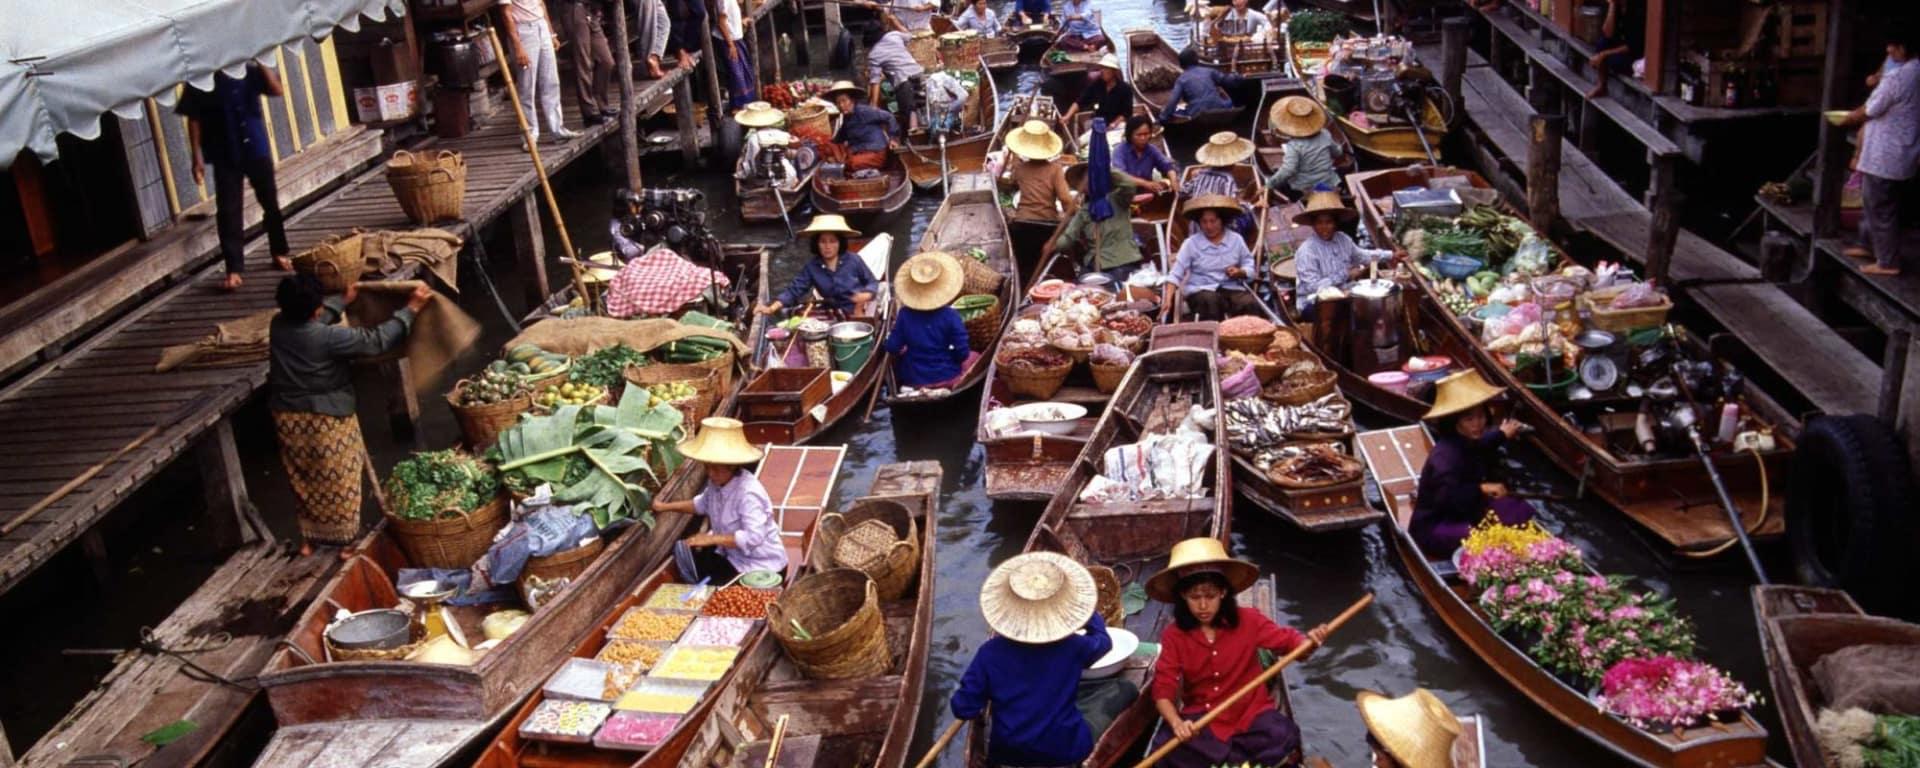 «Railway Market», marché flottant & vie villageoise à Bangkok: Bangkok: Damnoen Saduak Floating Market